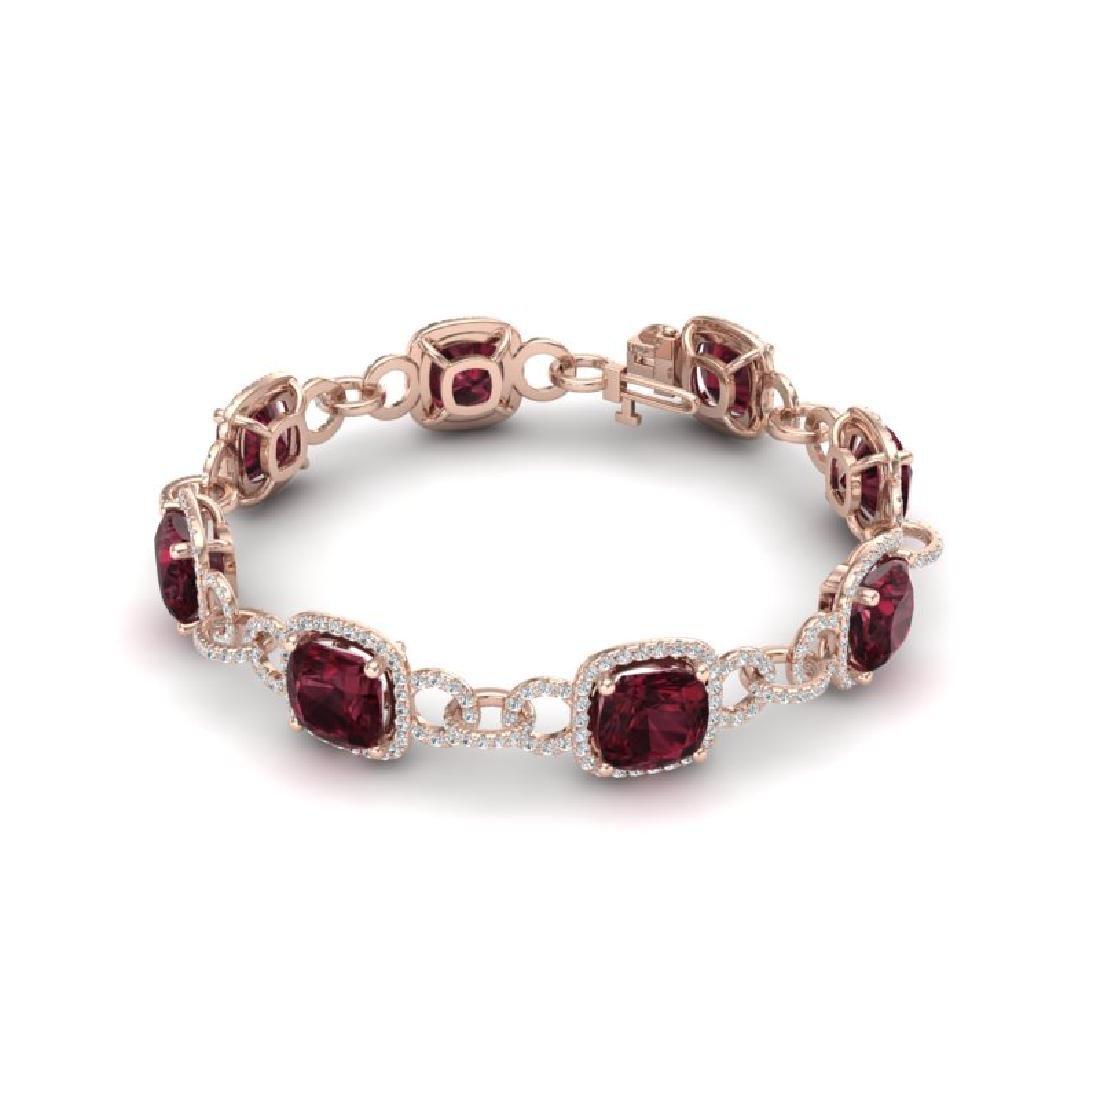 30 CTW Garnet & VS/SI Diamond Bracelet 14K Rose Gold - 2